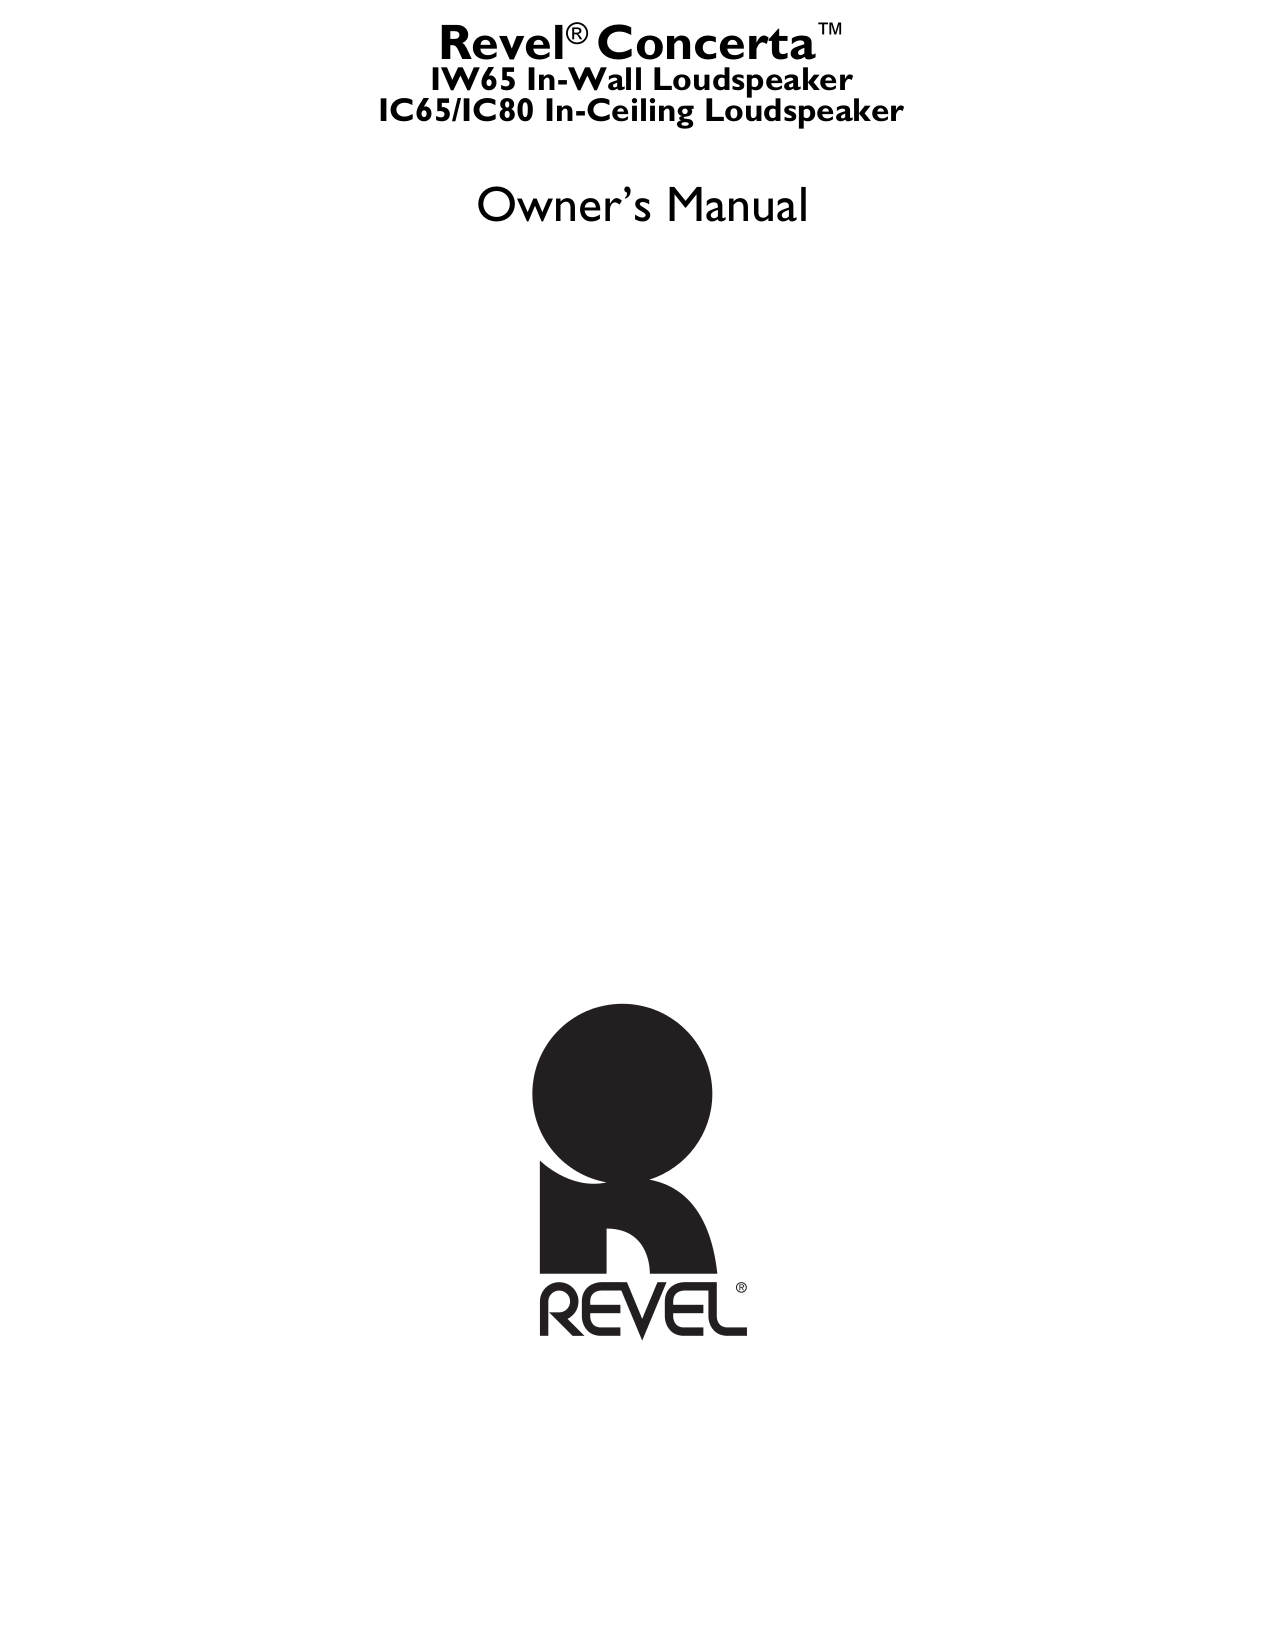 pdf for Revel Speaker Concerta IW65 manual